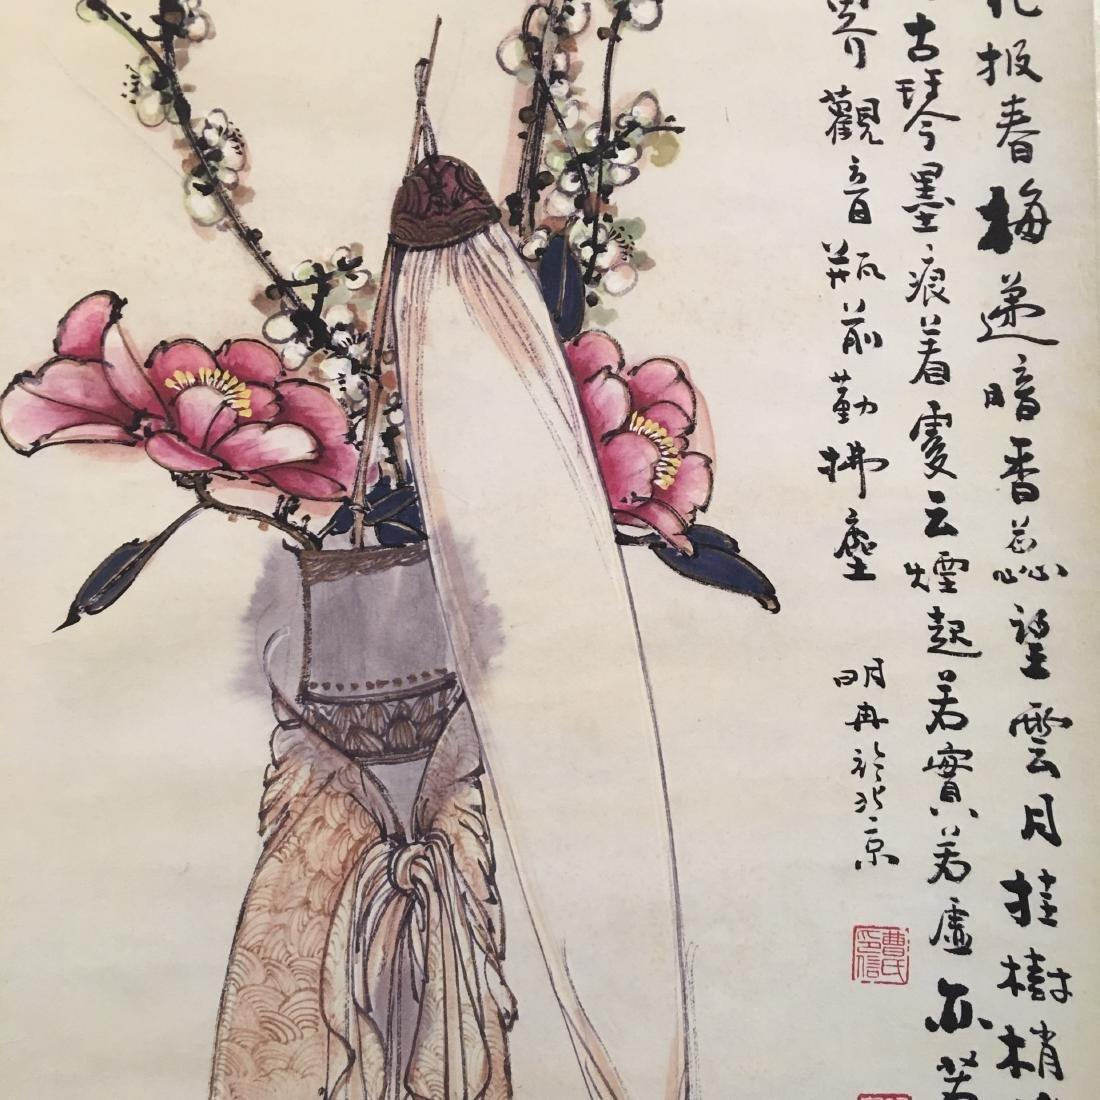 Chinese Hanging Scroll Painting, Ming Ran Signature - 2